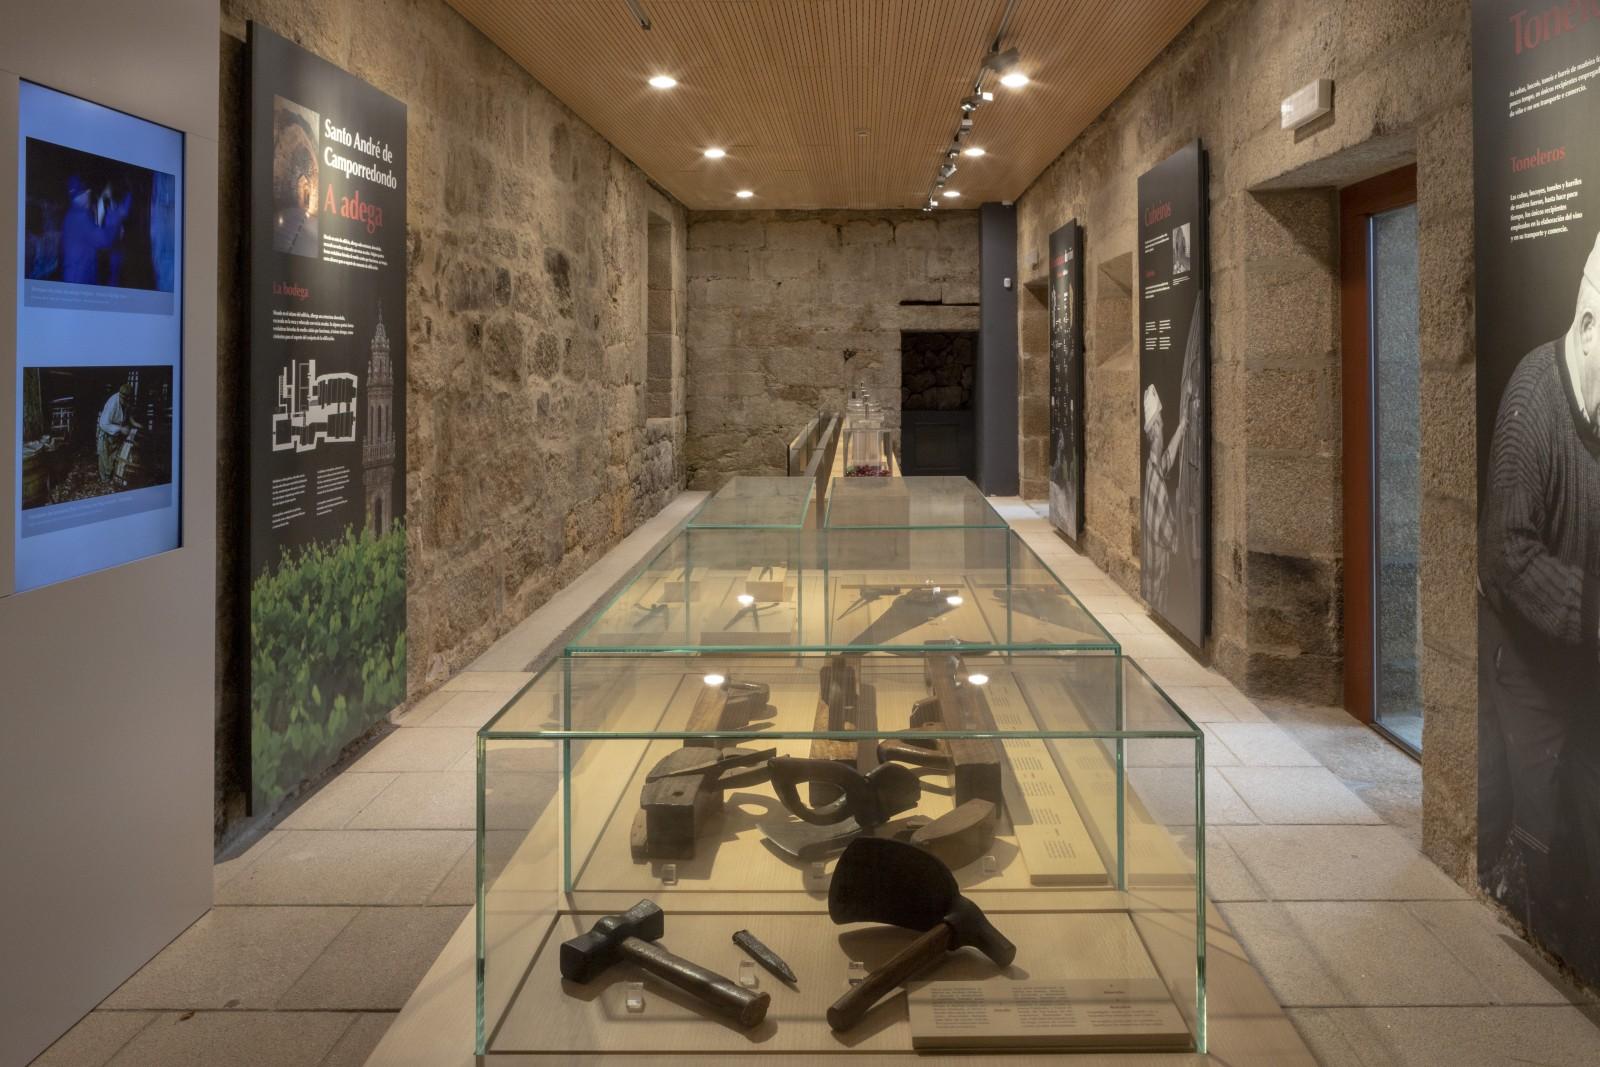 Sala 8 del Museo del Vino